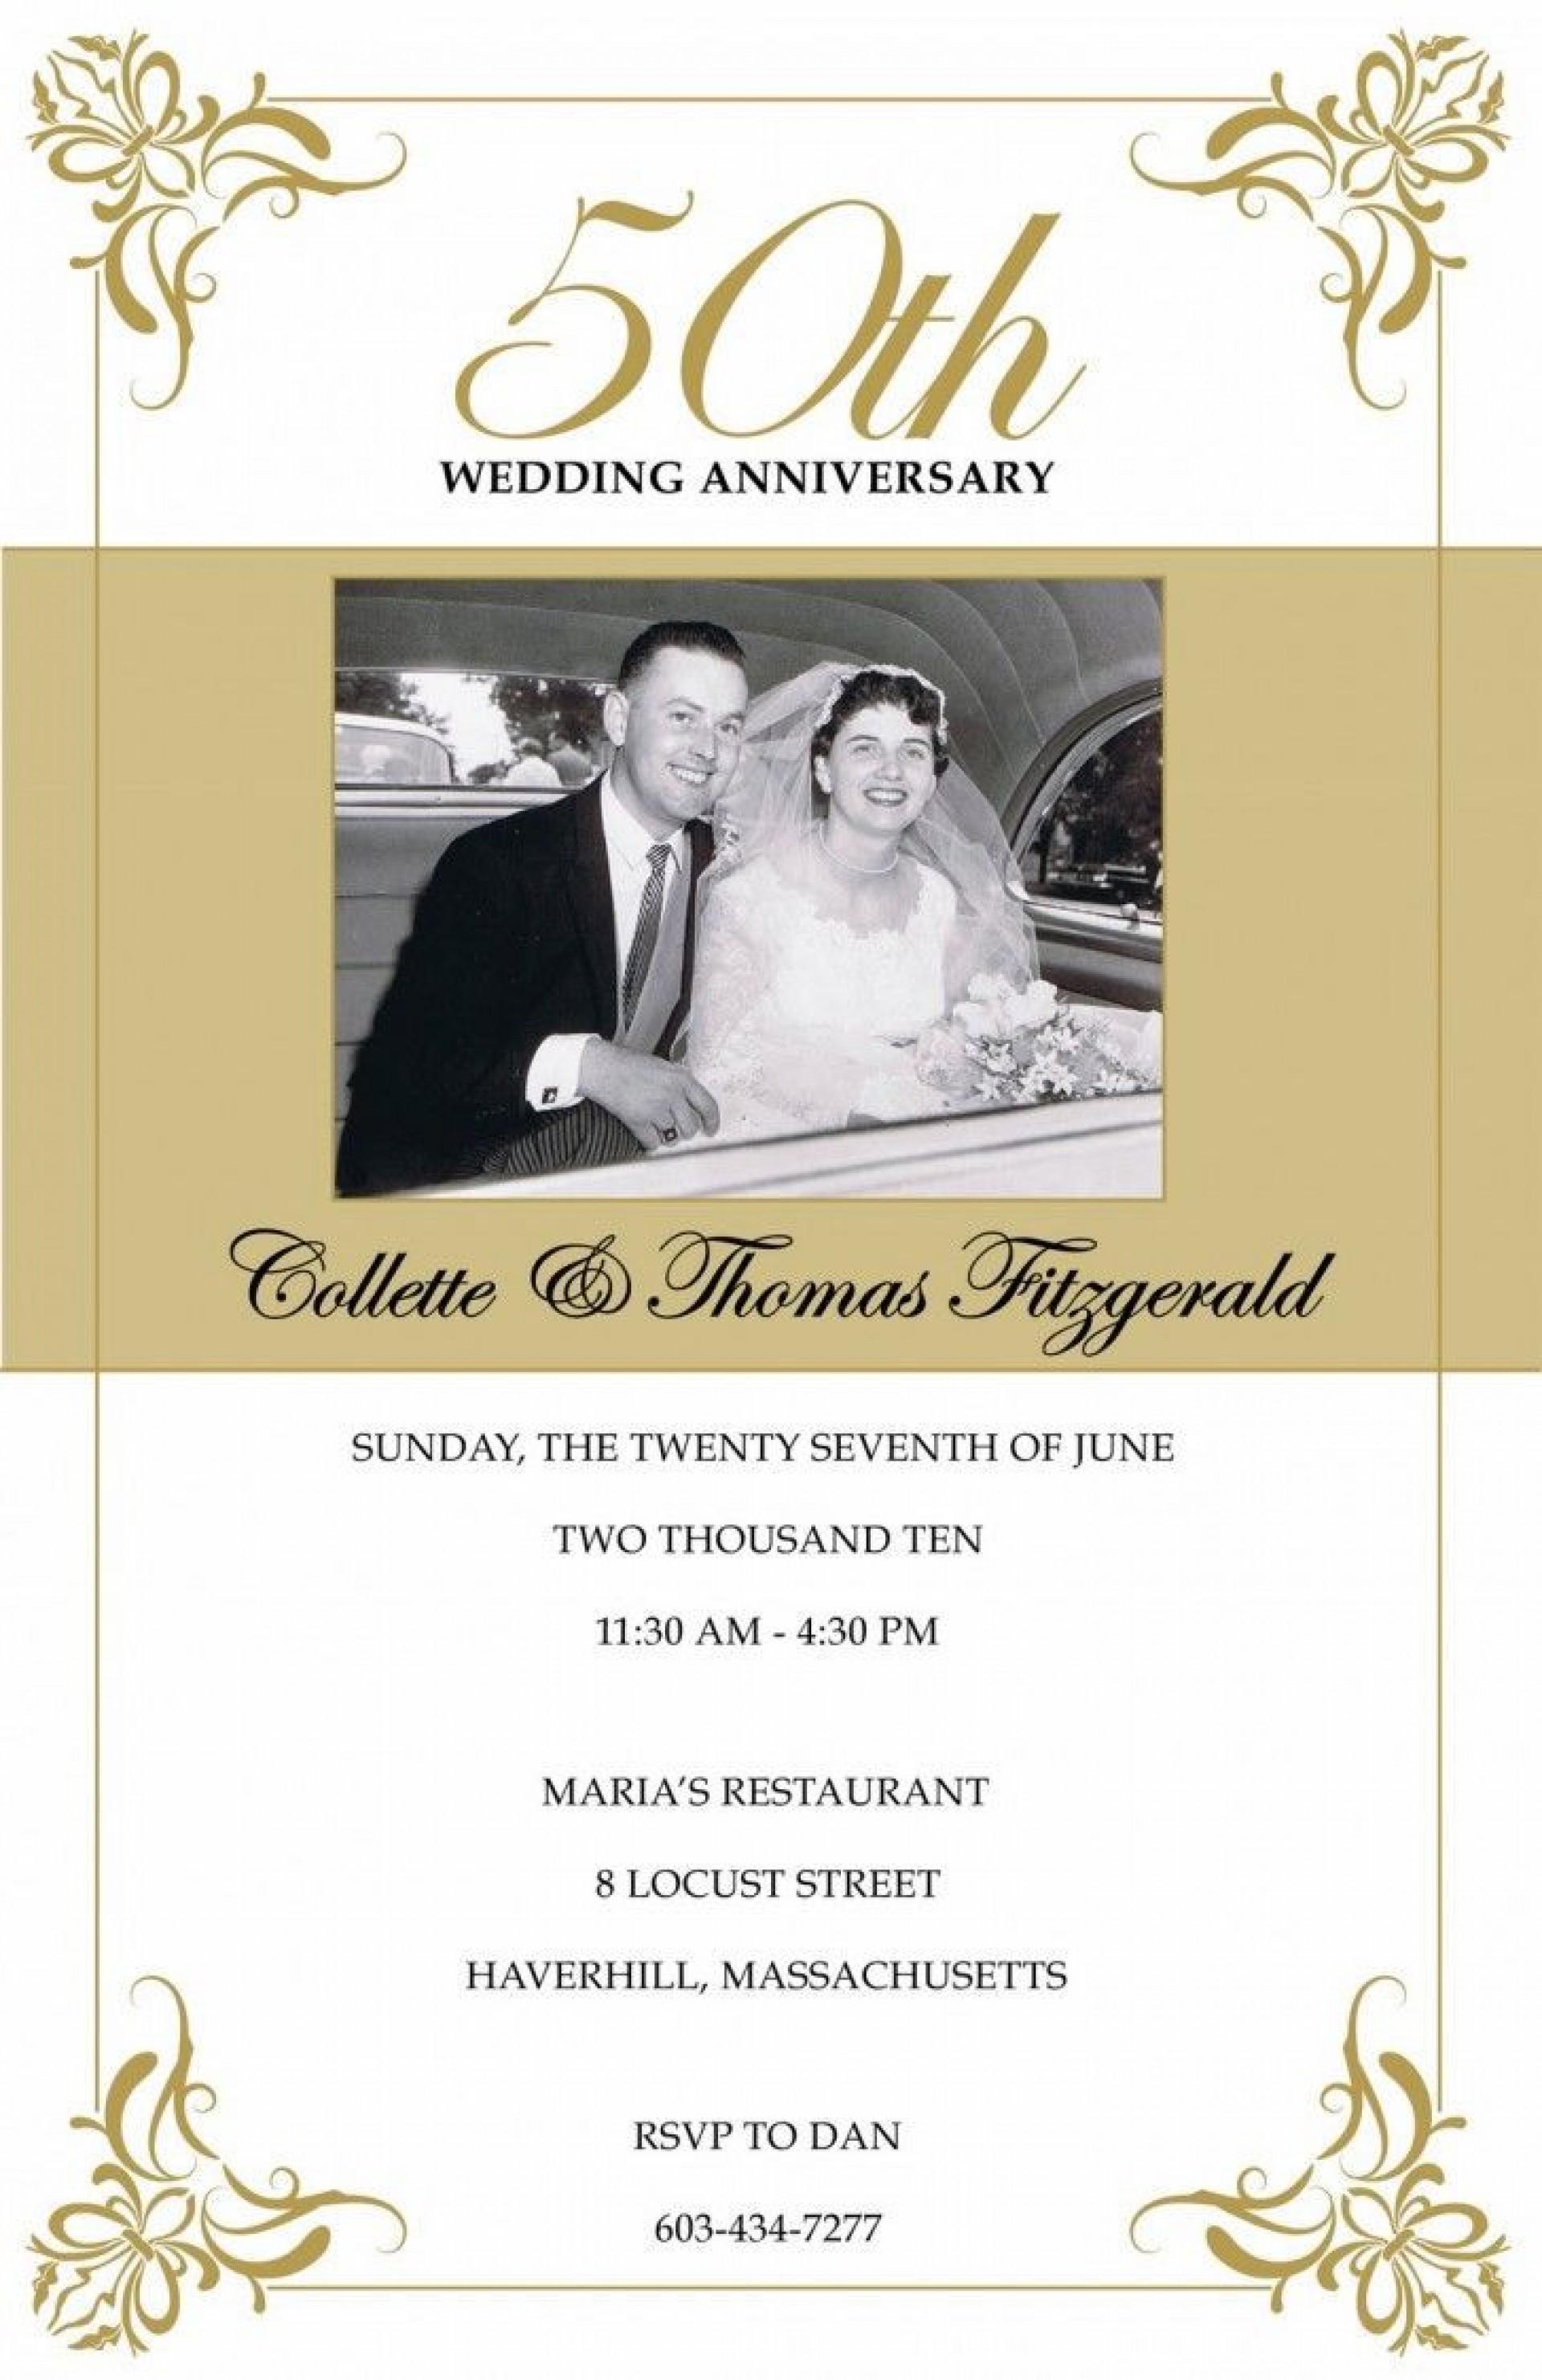 008 Wonderful Free Printable 50th Wedding Anniversary Invitation Template Image 1920